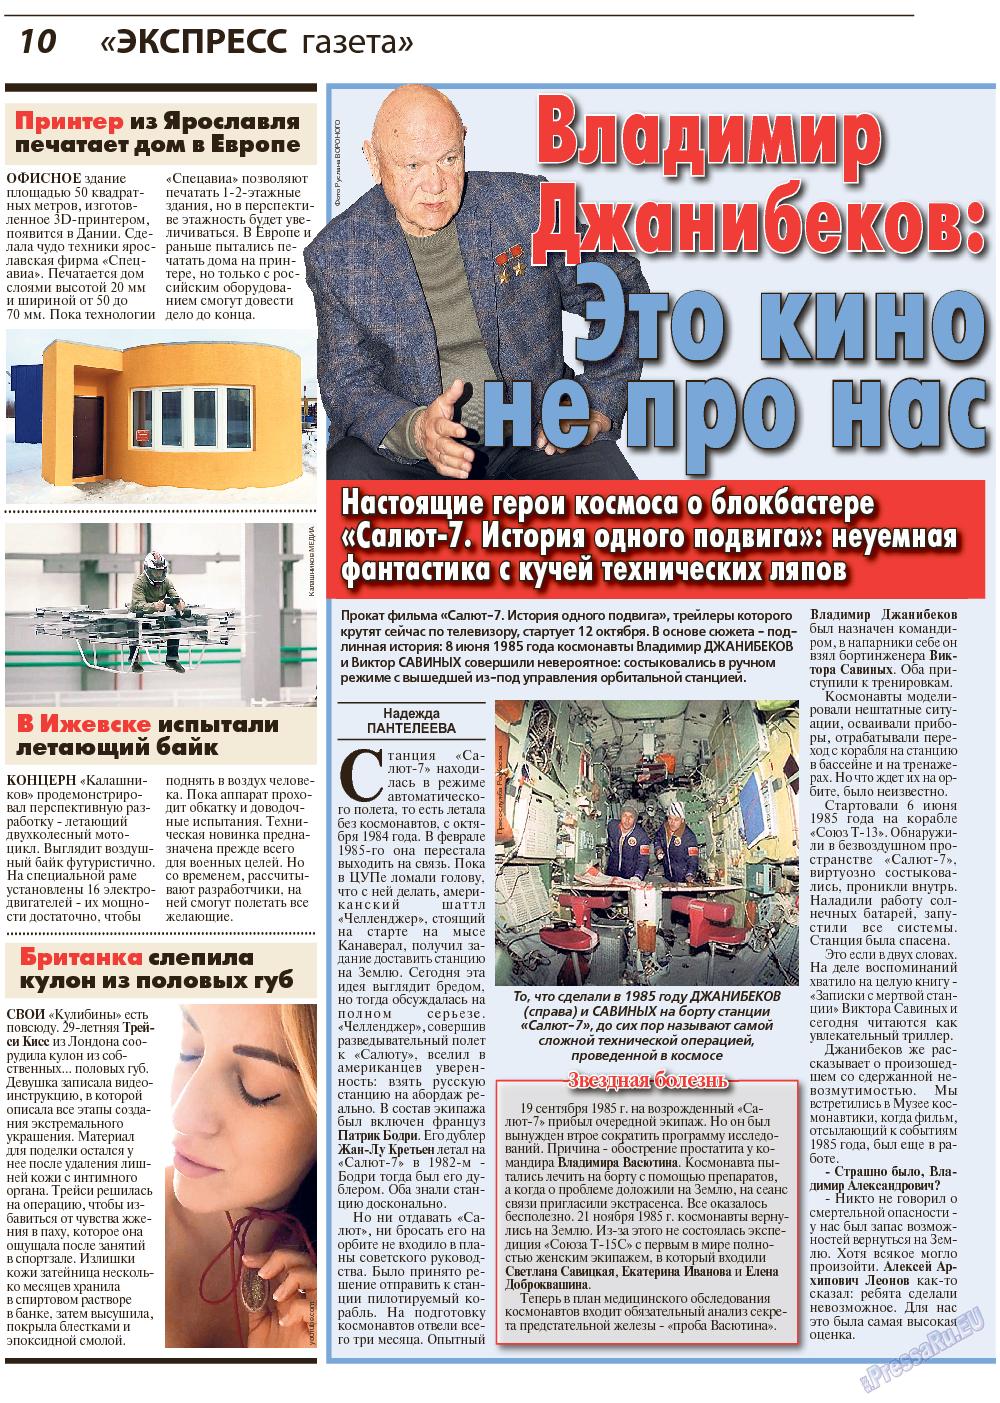 Экспресс газета (газета). 2017 год, номер 11, стр. 10